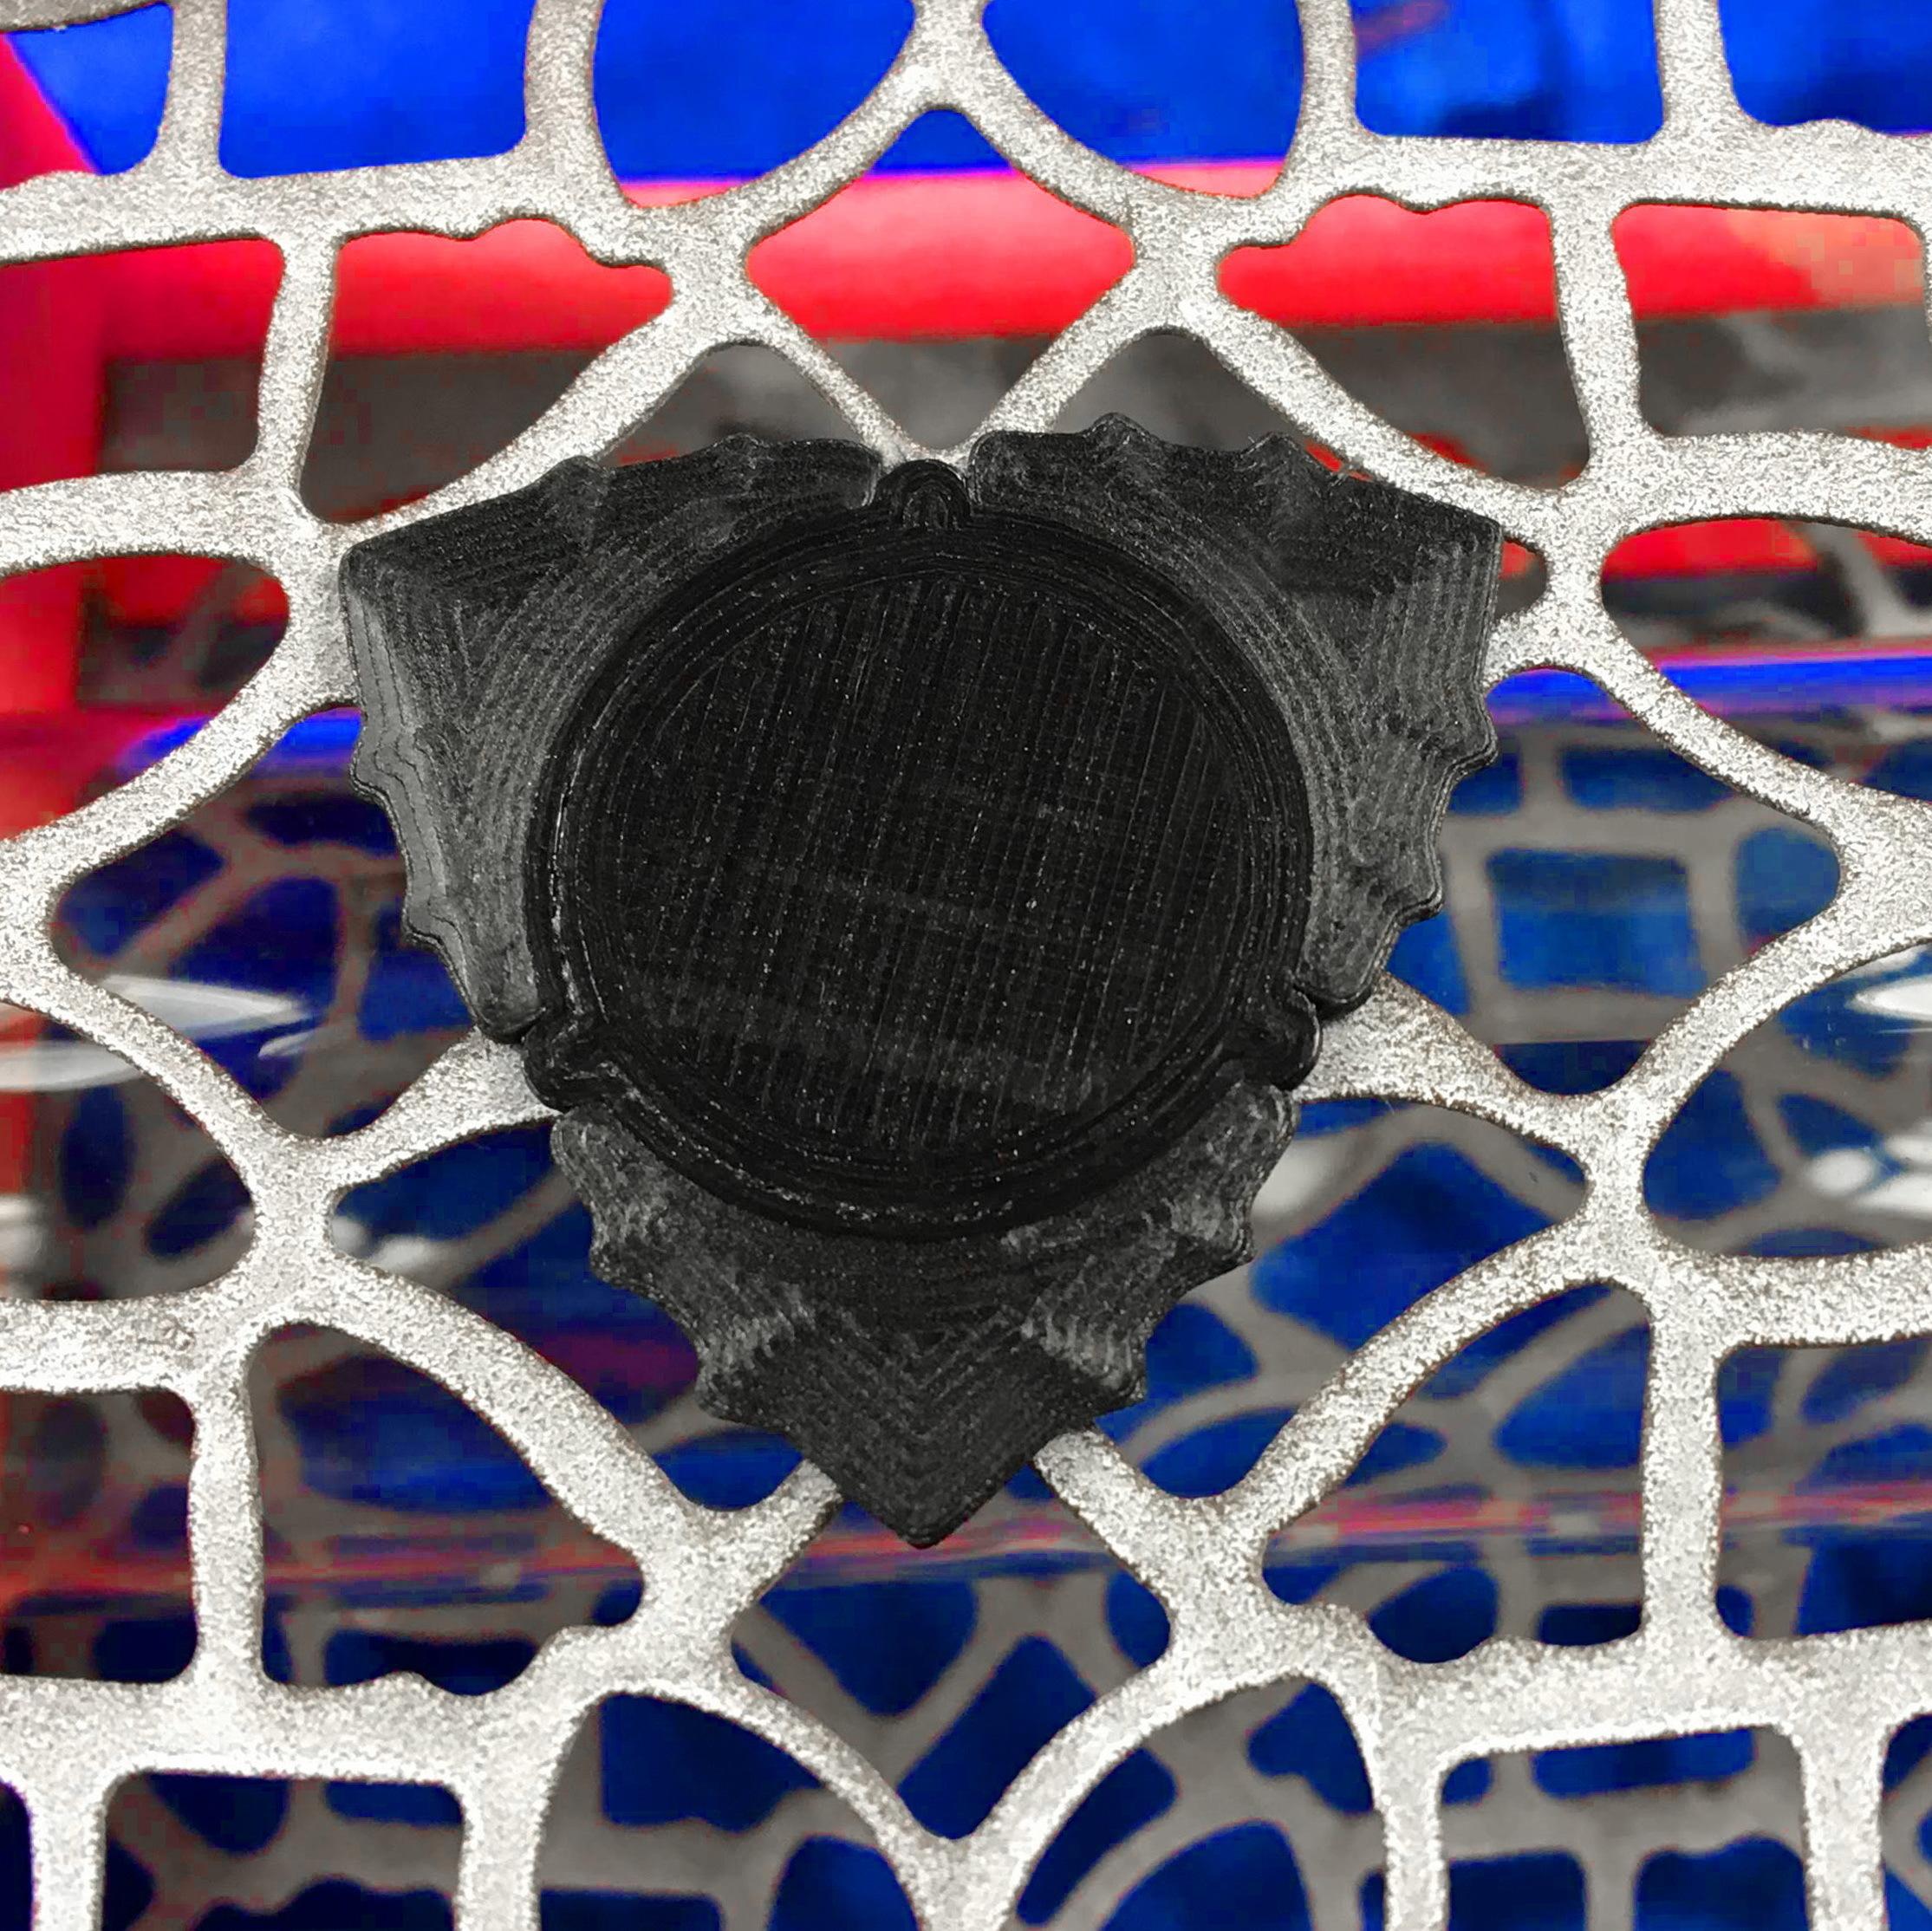 Flex Triangle-Dent Pua Nido 02052020.JPG Download free STL file FlexiPick TRIANGLE-DENT flexible electric guitar nest 3D Carbon fiber and TPU • Design to 3D print, carleslluisar